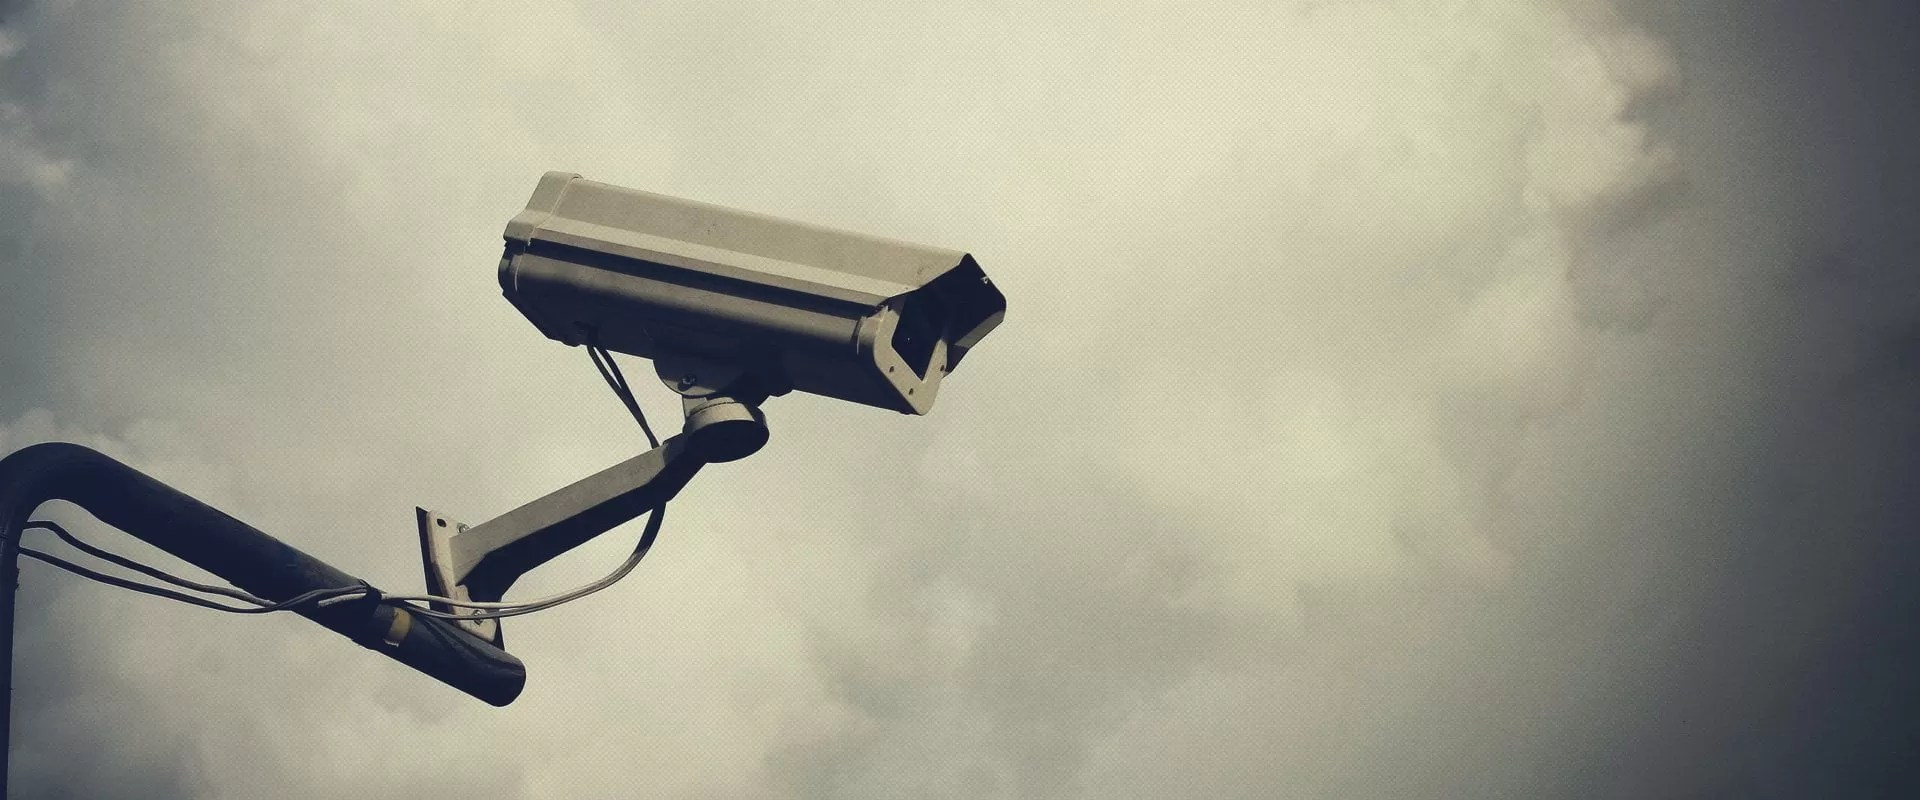 BBG security camera Ajax